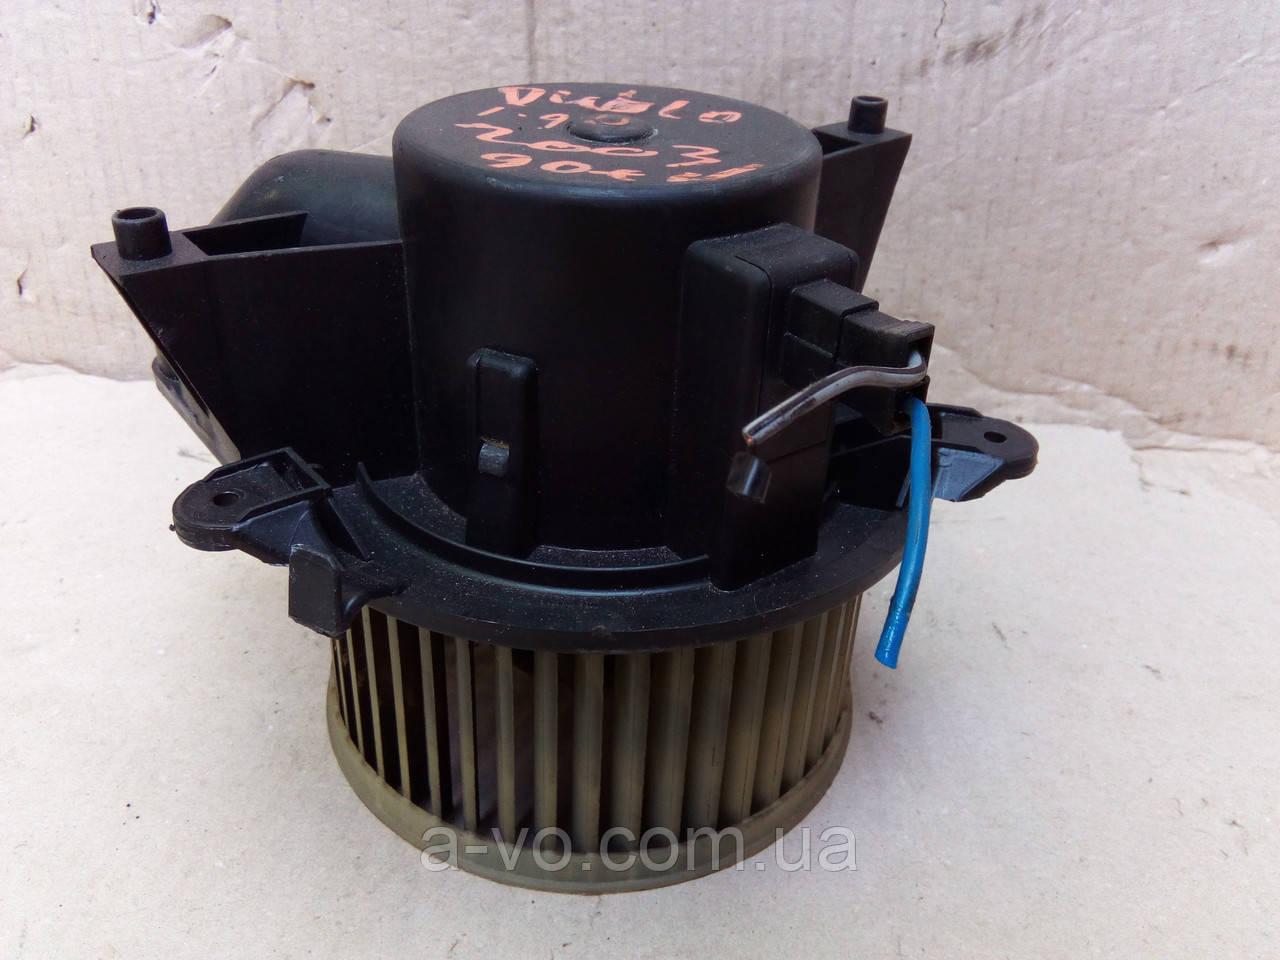 Вентилятор моторчик печки для Fiat Doblo 1 Punto 2, 1.417.306.0.0, 07353372850, 141730600